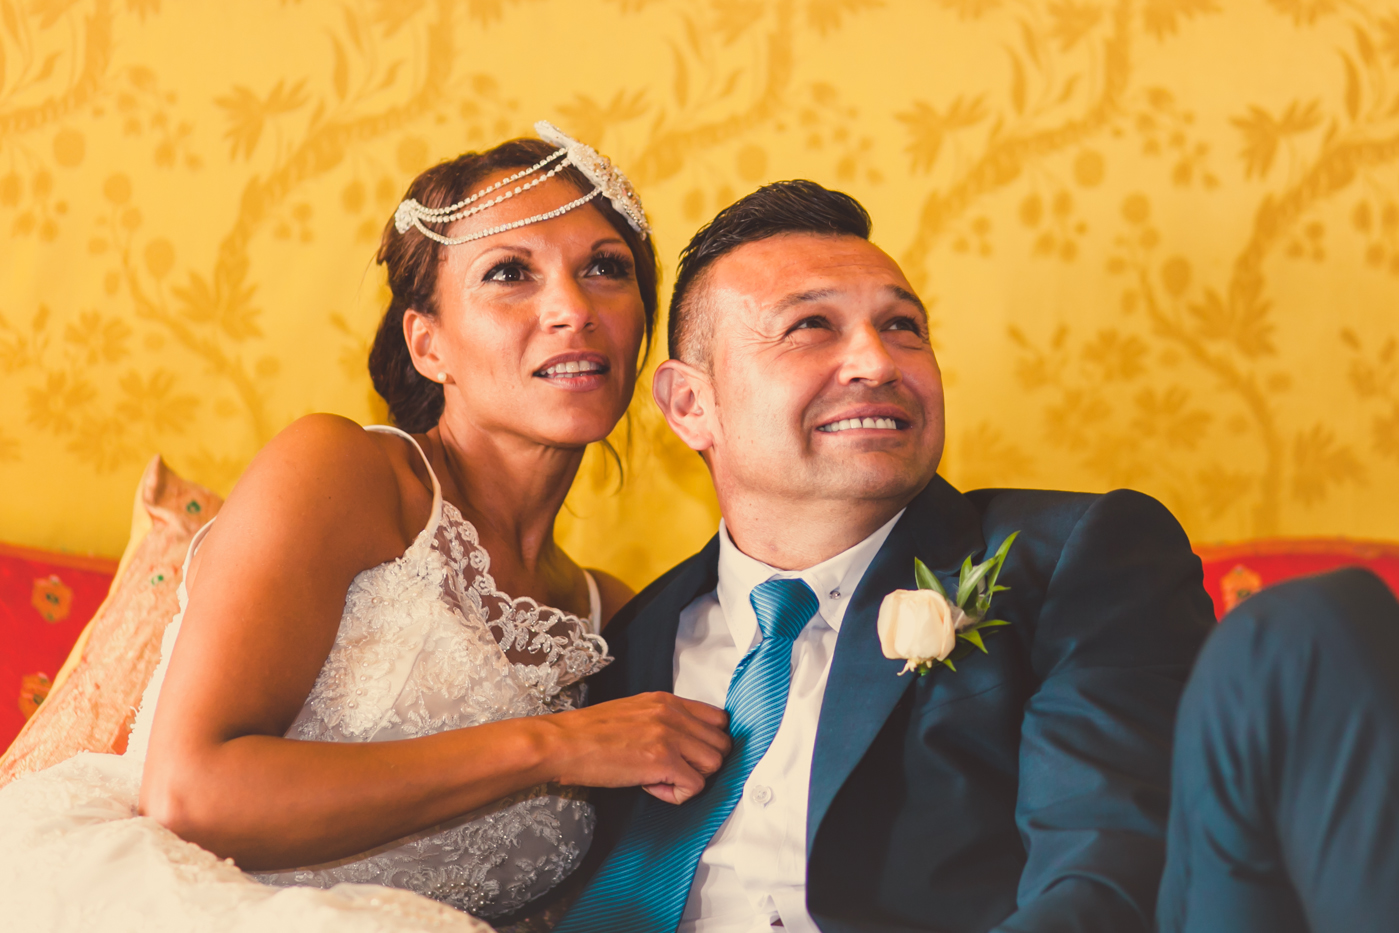 127 Donna and John Wedding Photography at Belvoir Castle www.belvoircastle.com UK by Mark Pugh.JPG